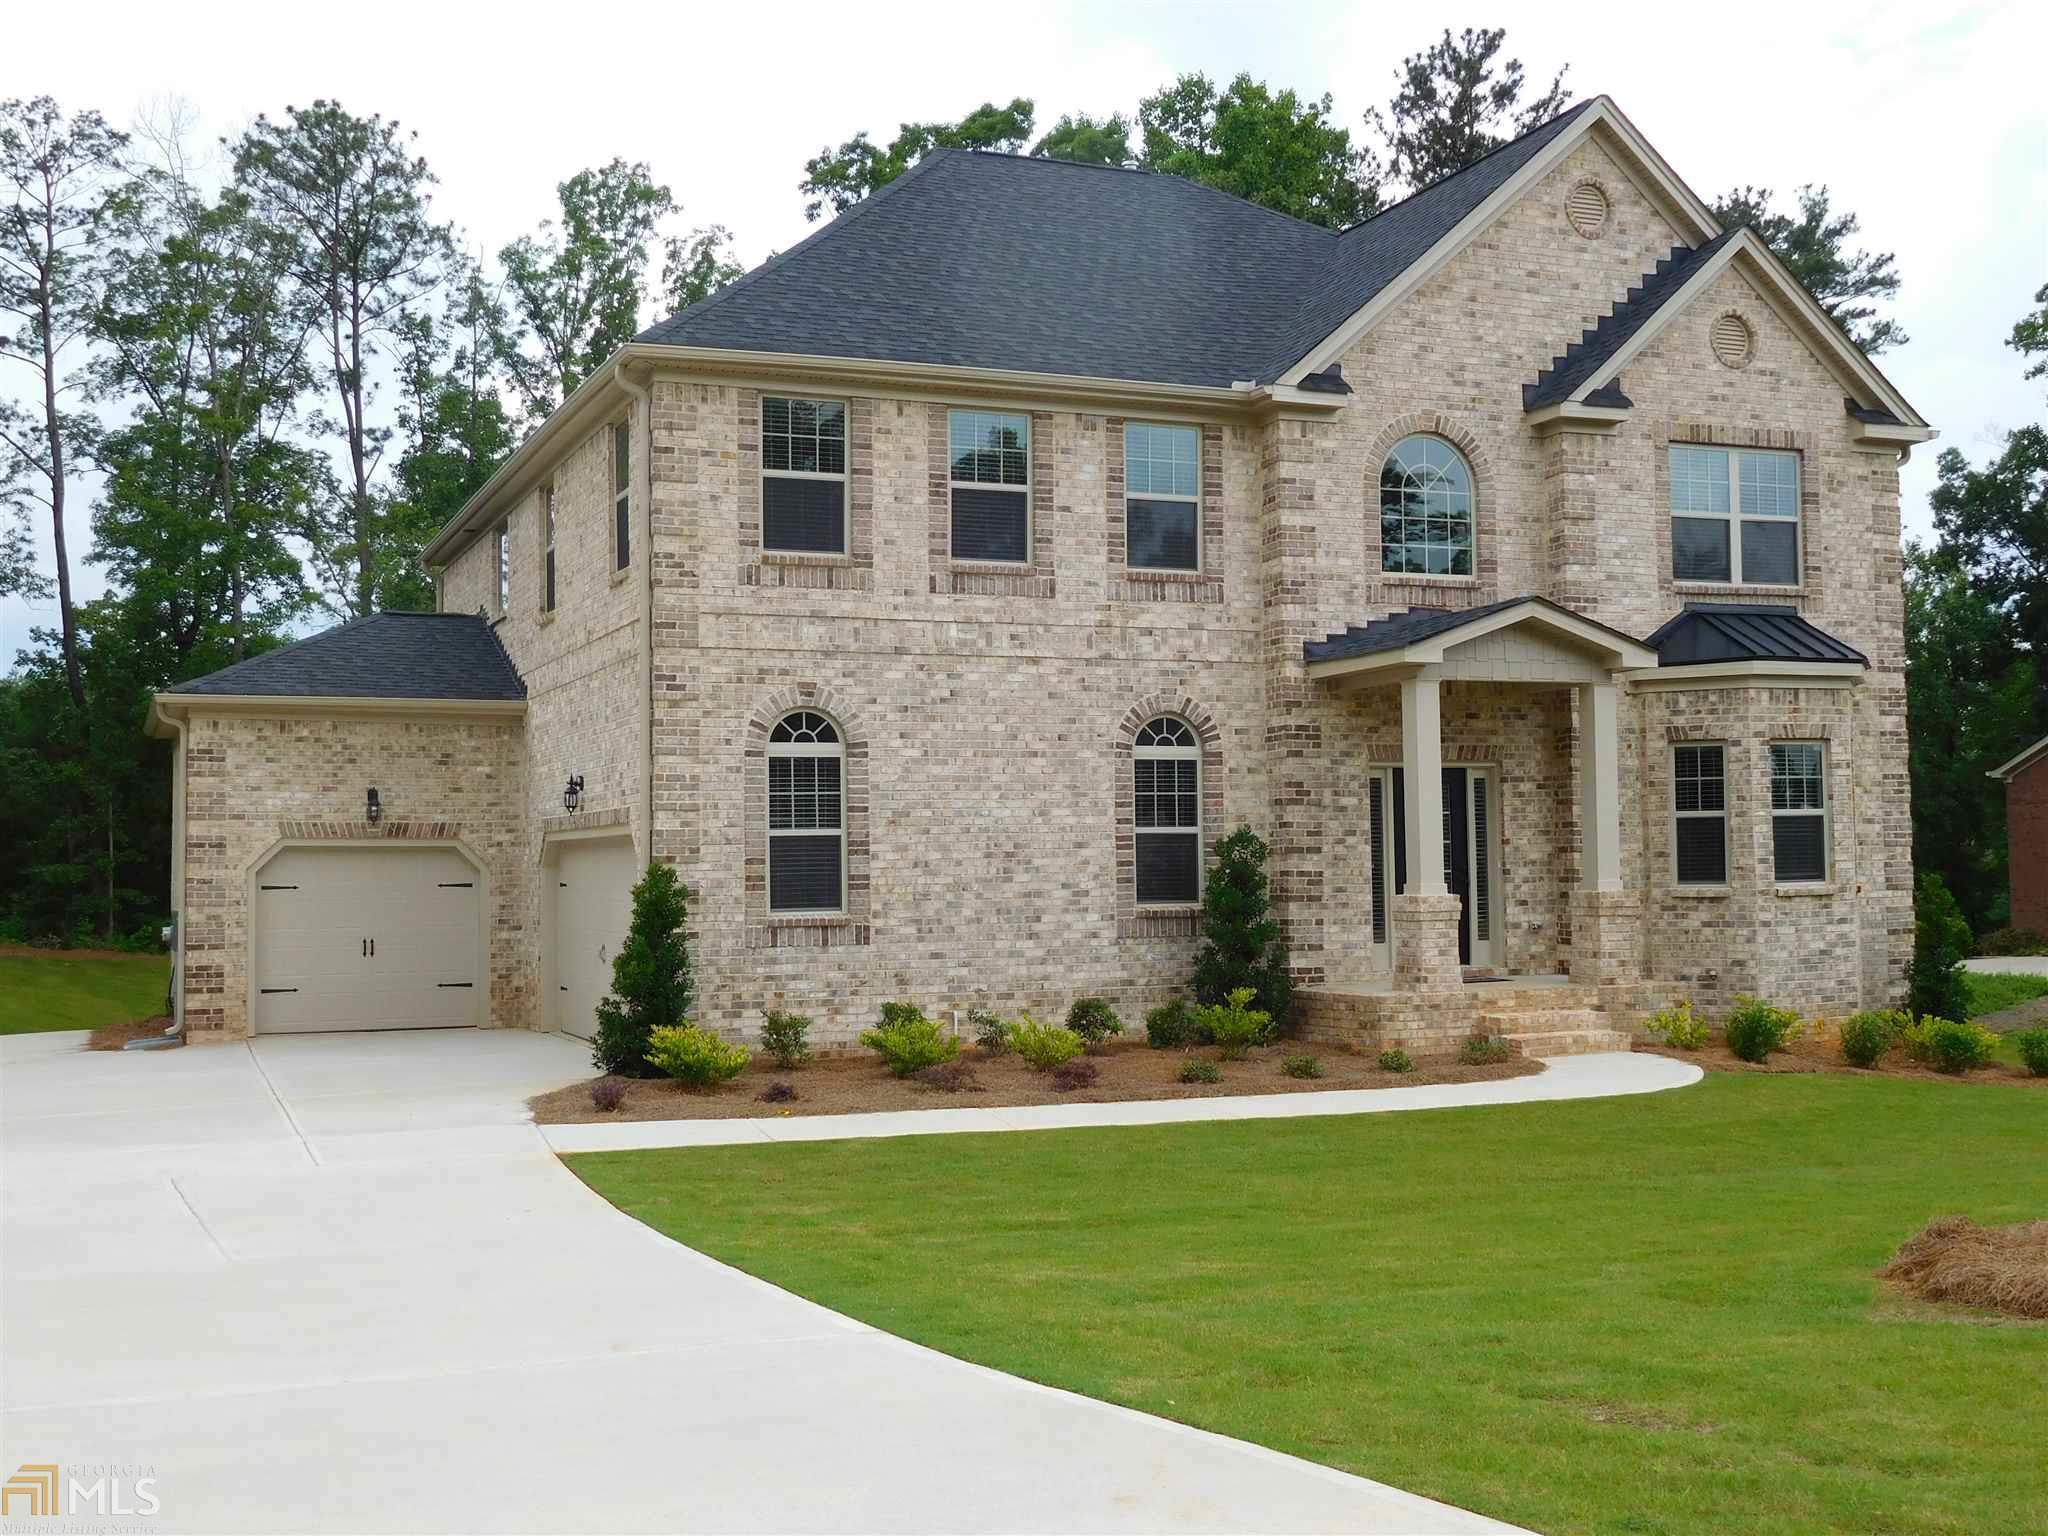 Crystal Lake Mcdonough Ga Homes For Sale